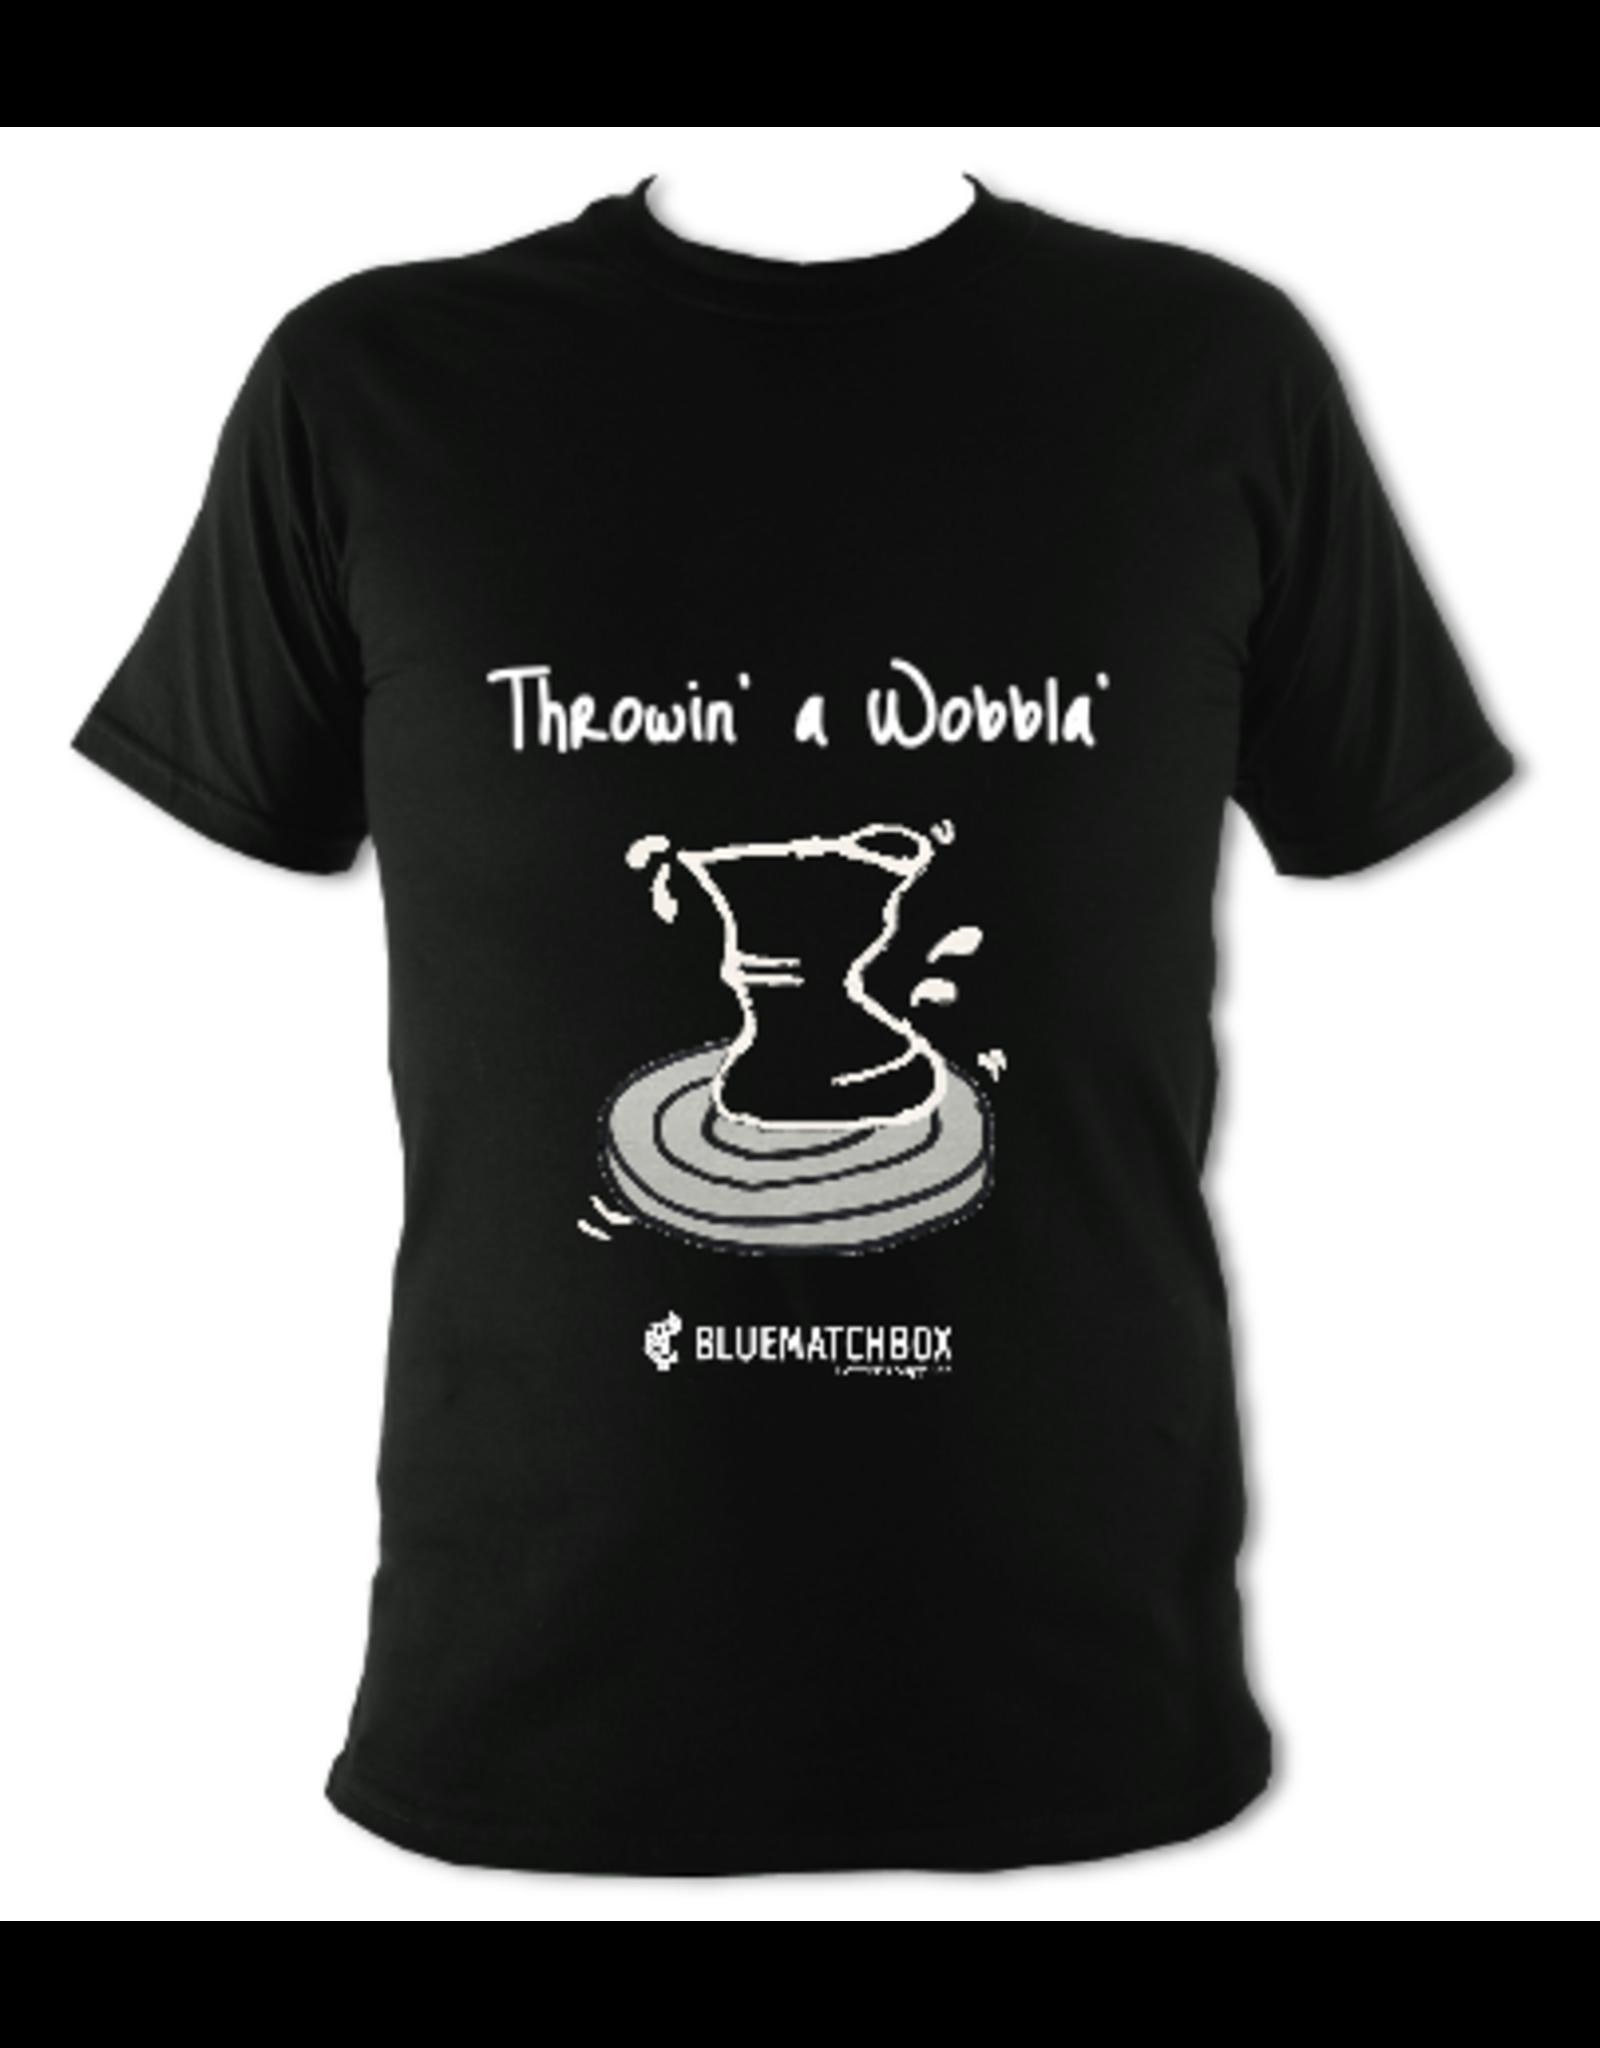 Throwin' a Wobbla' T-shirt